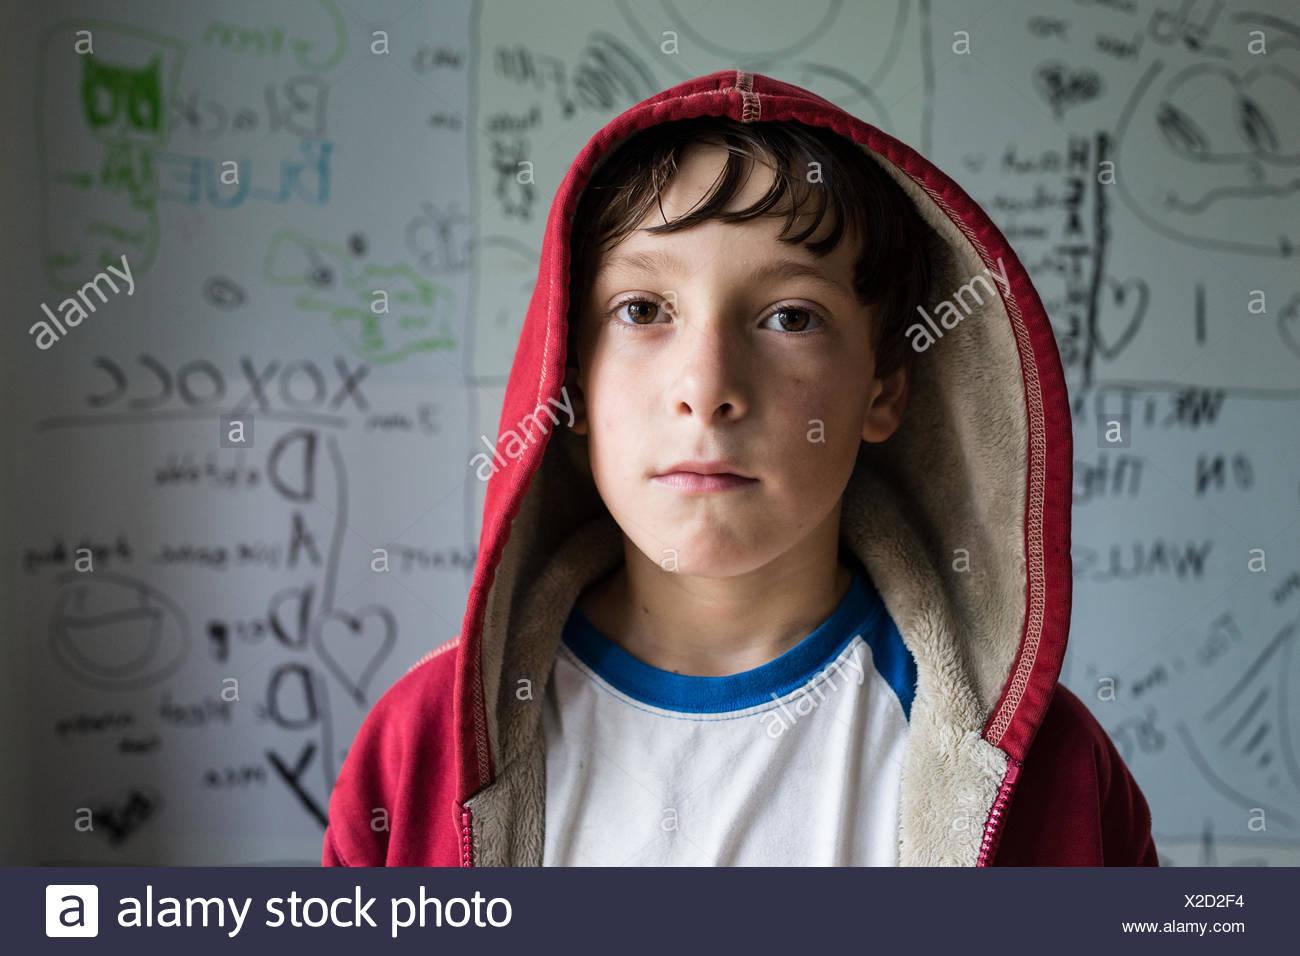 Portrait of boy wearing a red hooded sweatshirt. - Stock Image